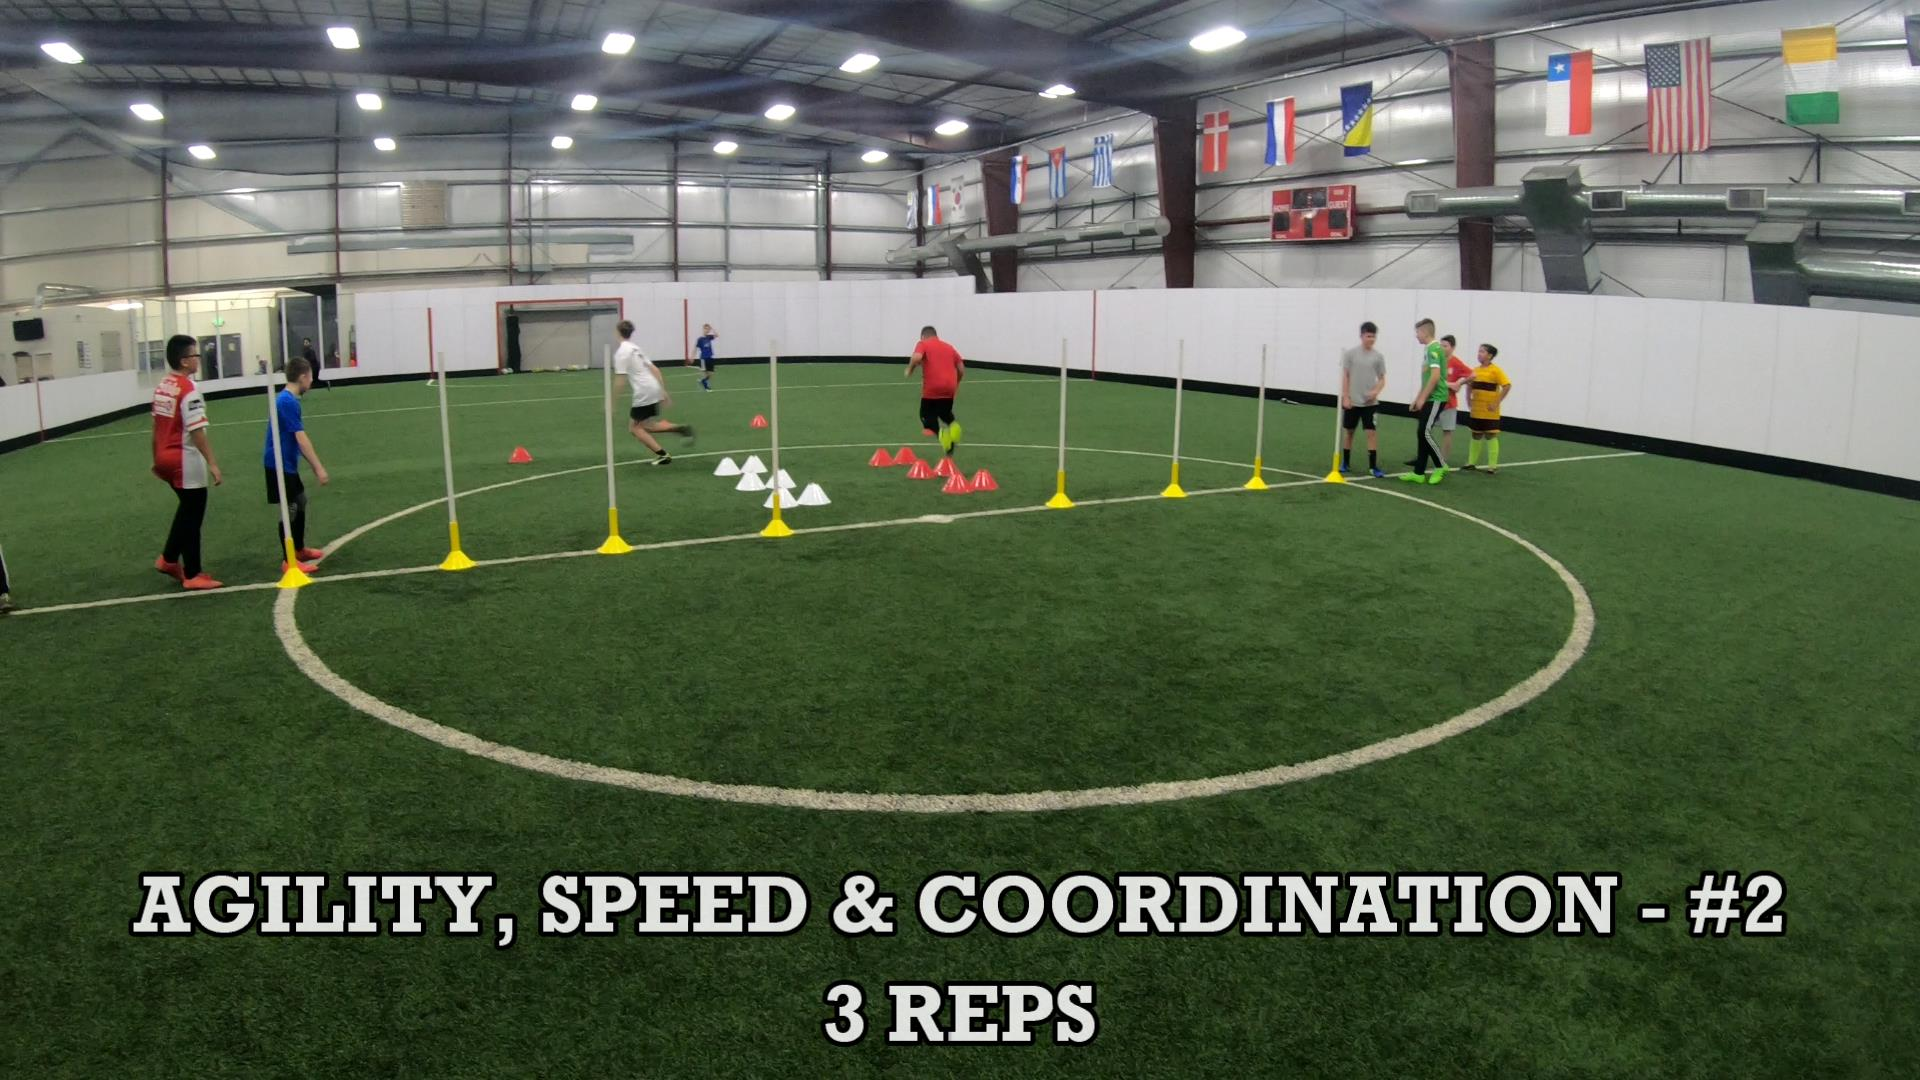 Soccer Coaching Session Plan 5